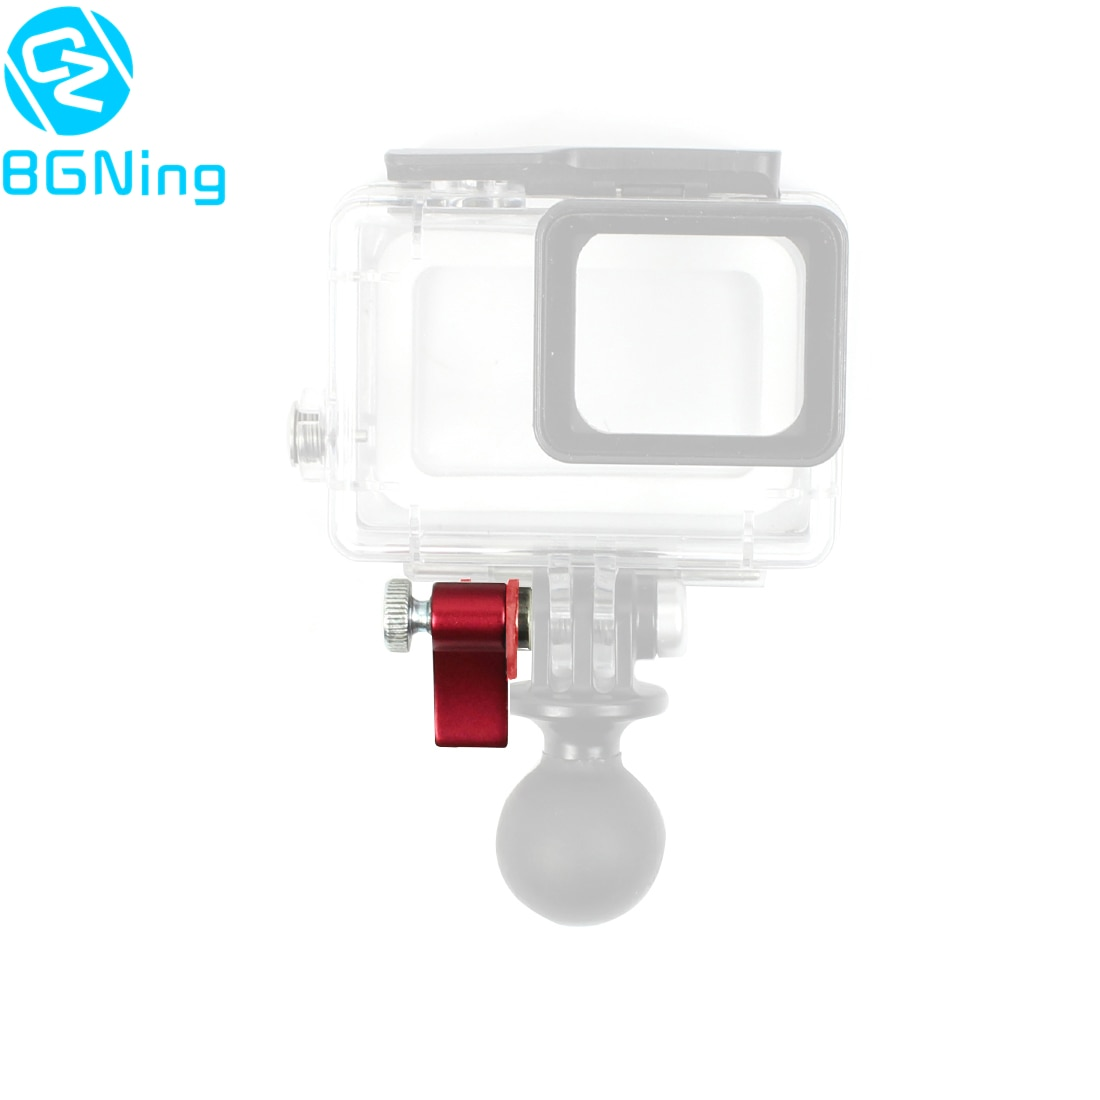 BGNing adaptador de llave de Tornillo de montaje de liberación rápida, Universal de aluminio M5 * 17mm M5 * 25mm para Gopro YI Sjcam EKEN Cámara deportiva